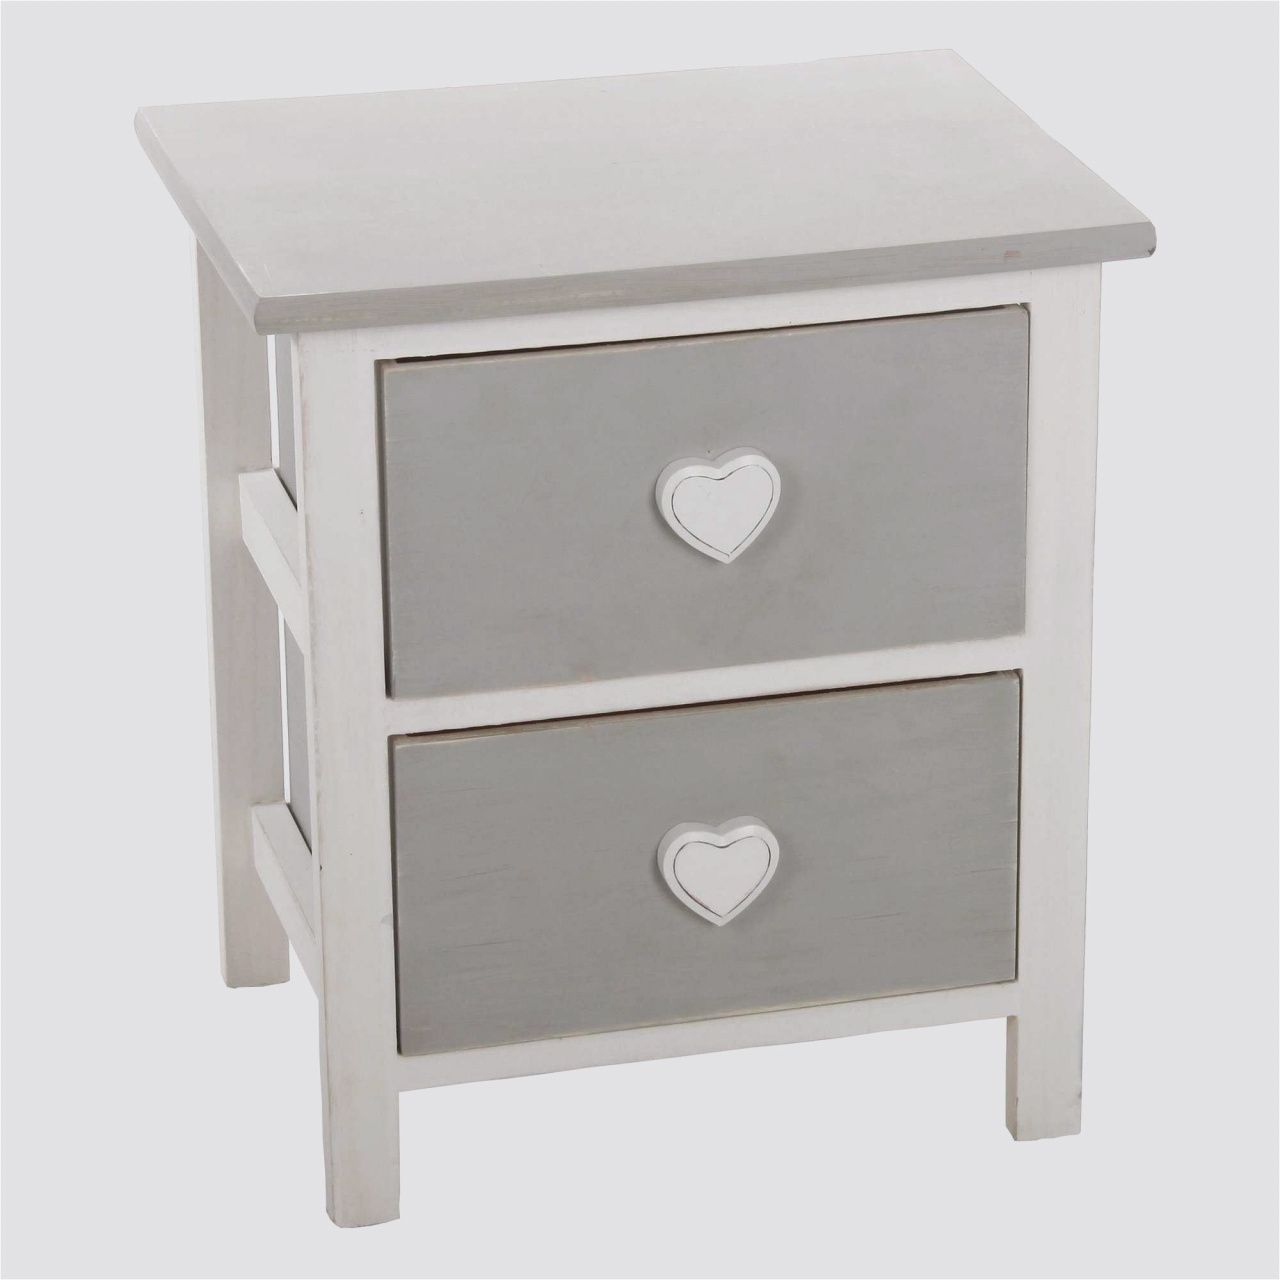 200 Foir Fouille Table De Chevet   Furniture, Table, Decor avec Salon De Jardin La Foir Fouille